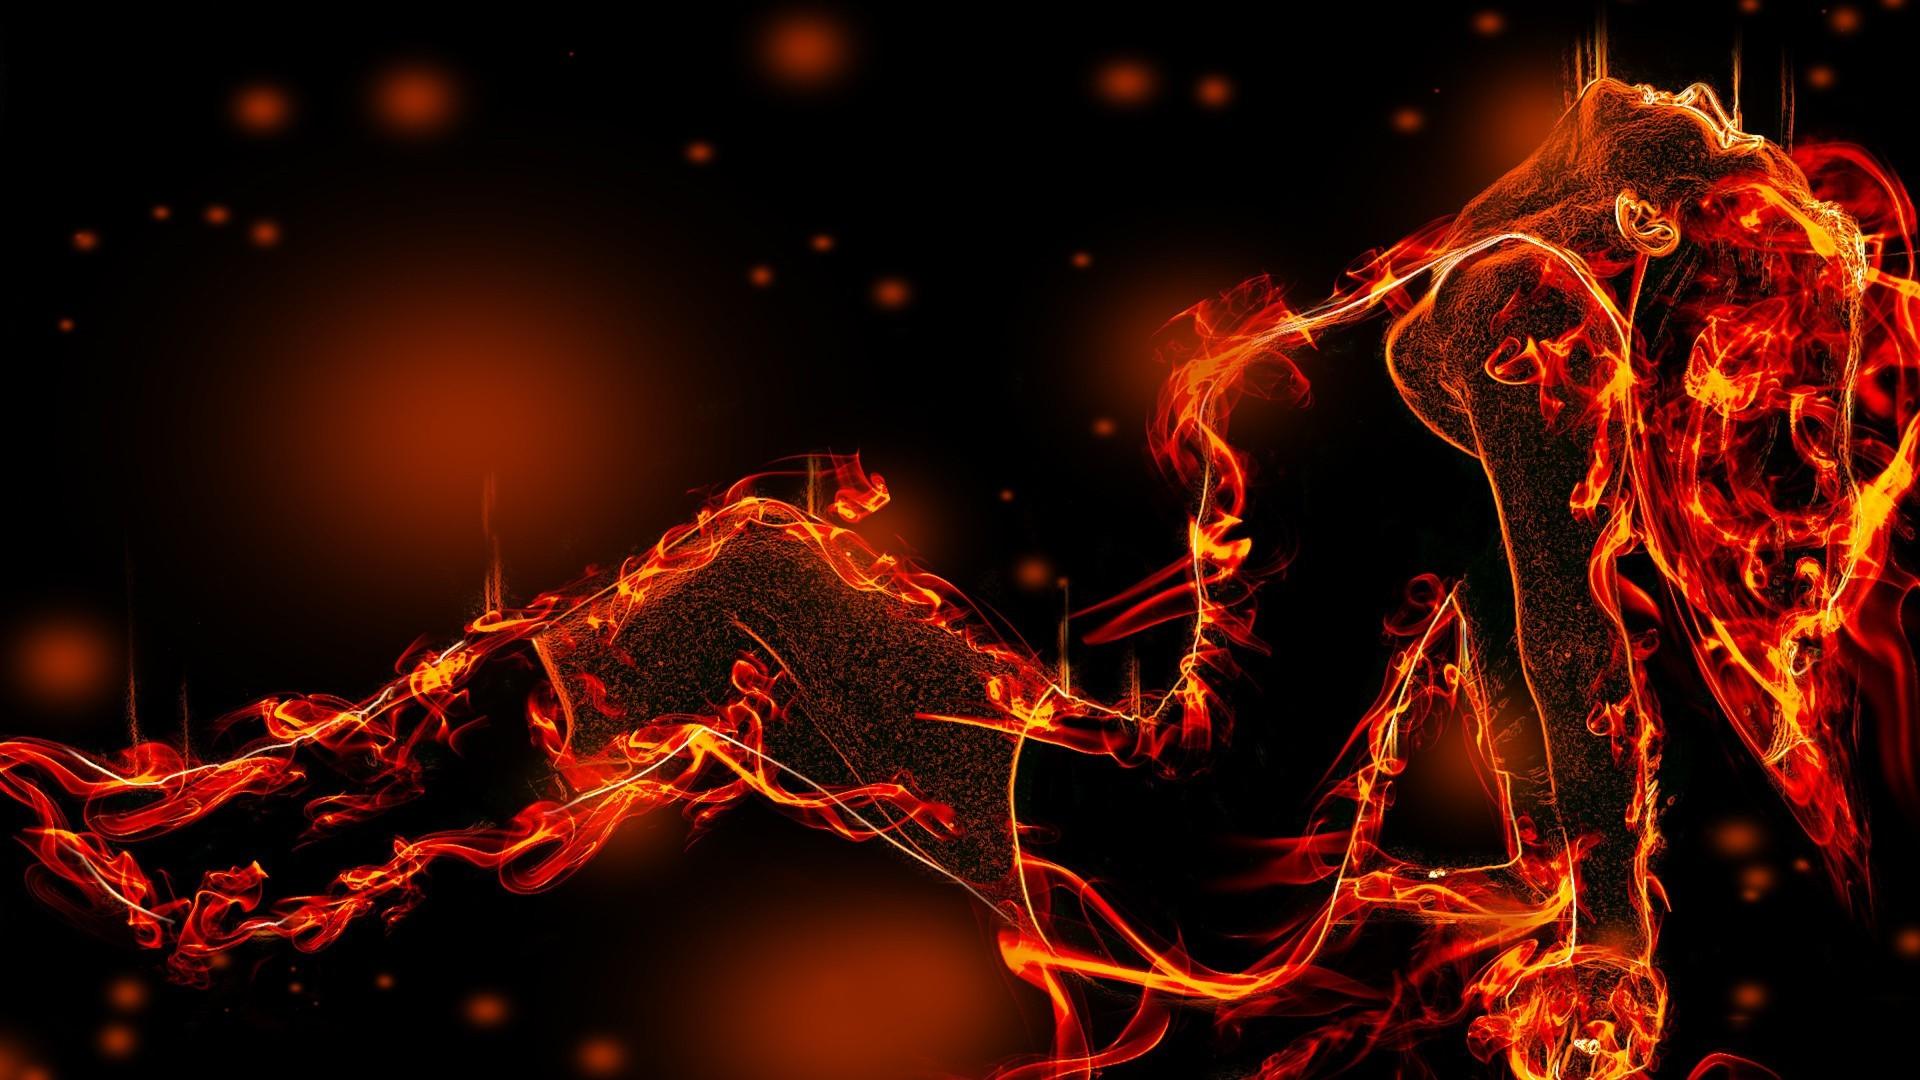 Res: 1920x1080, chica fire hermosa dw da abstract fantasy hd wallpaper